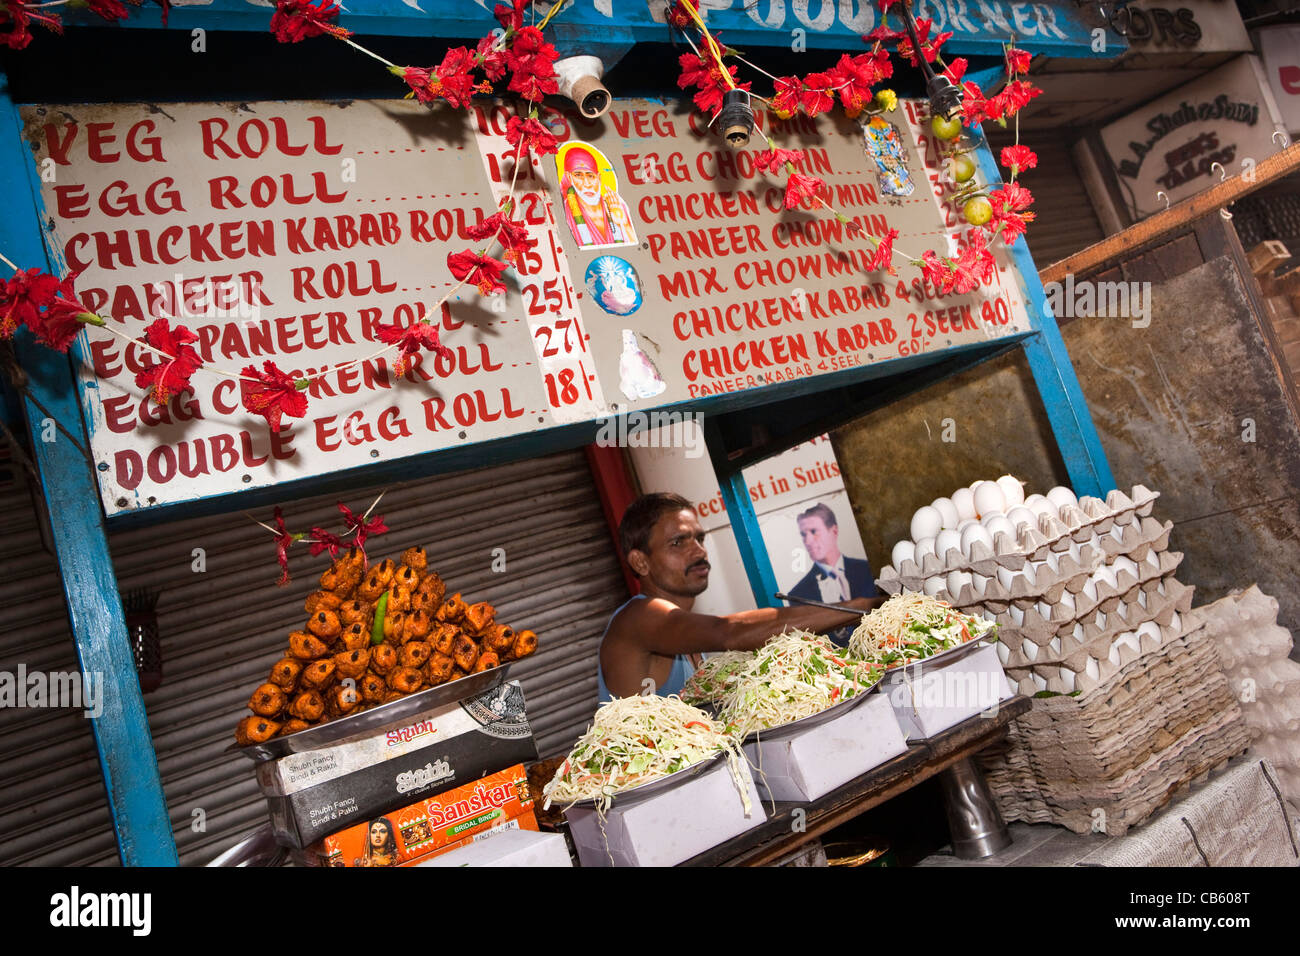 India, West Bengal, Kolkata, Chowringhee, New Market, Lindsay Street roadside roll stall - Stock Image